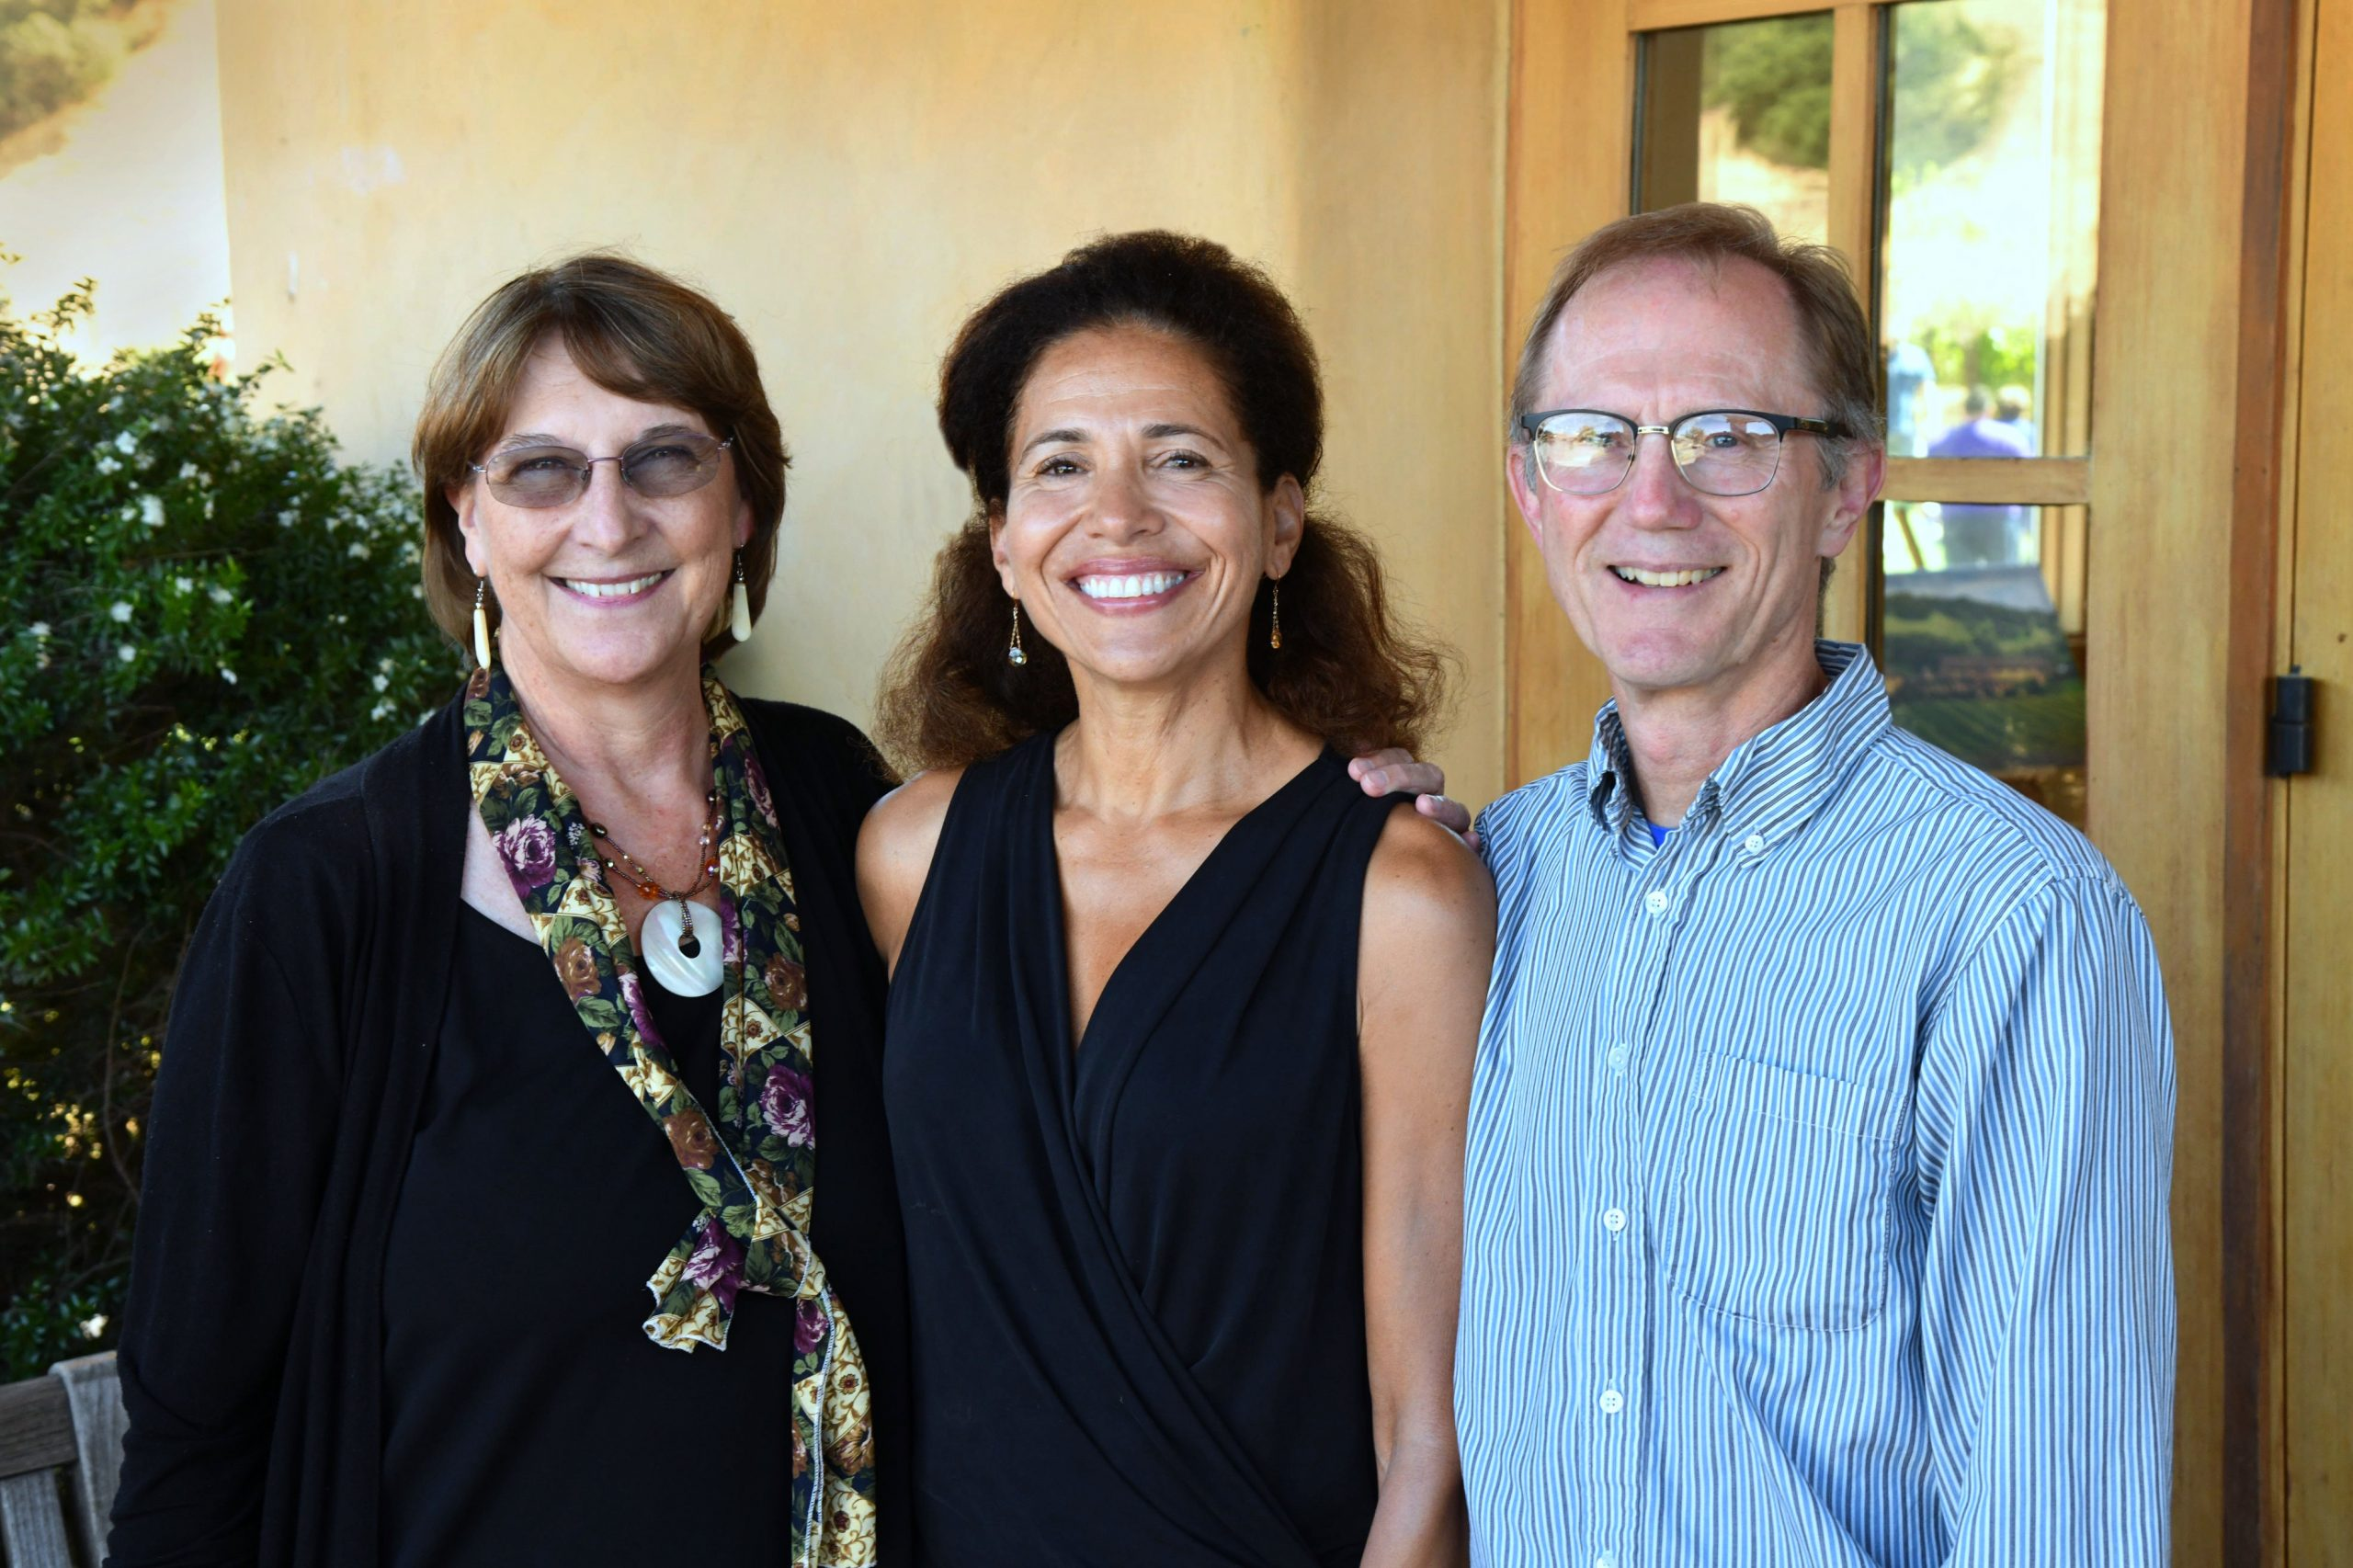 Terry Ehret, Nancy Morales, and John Johnson